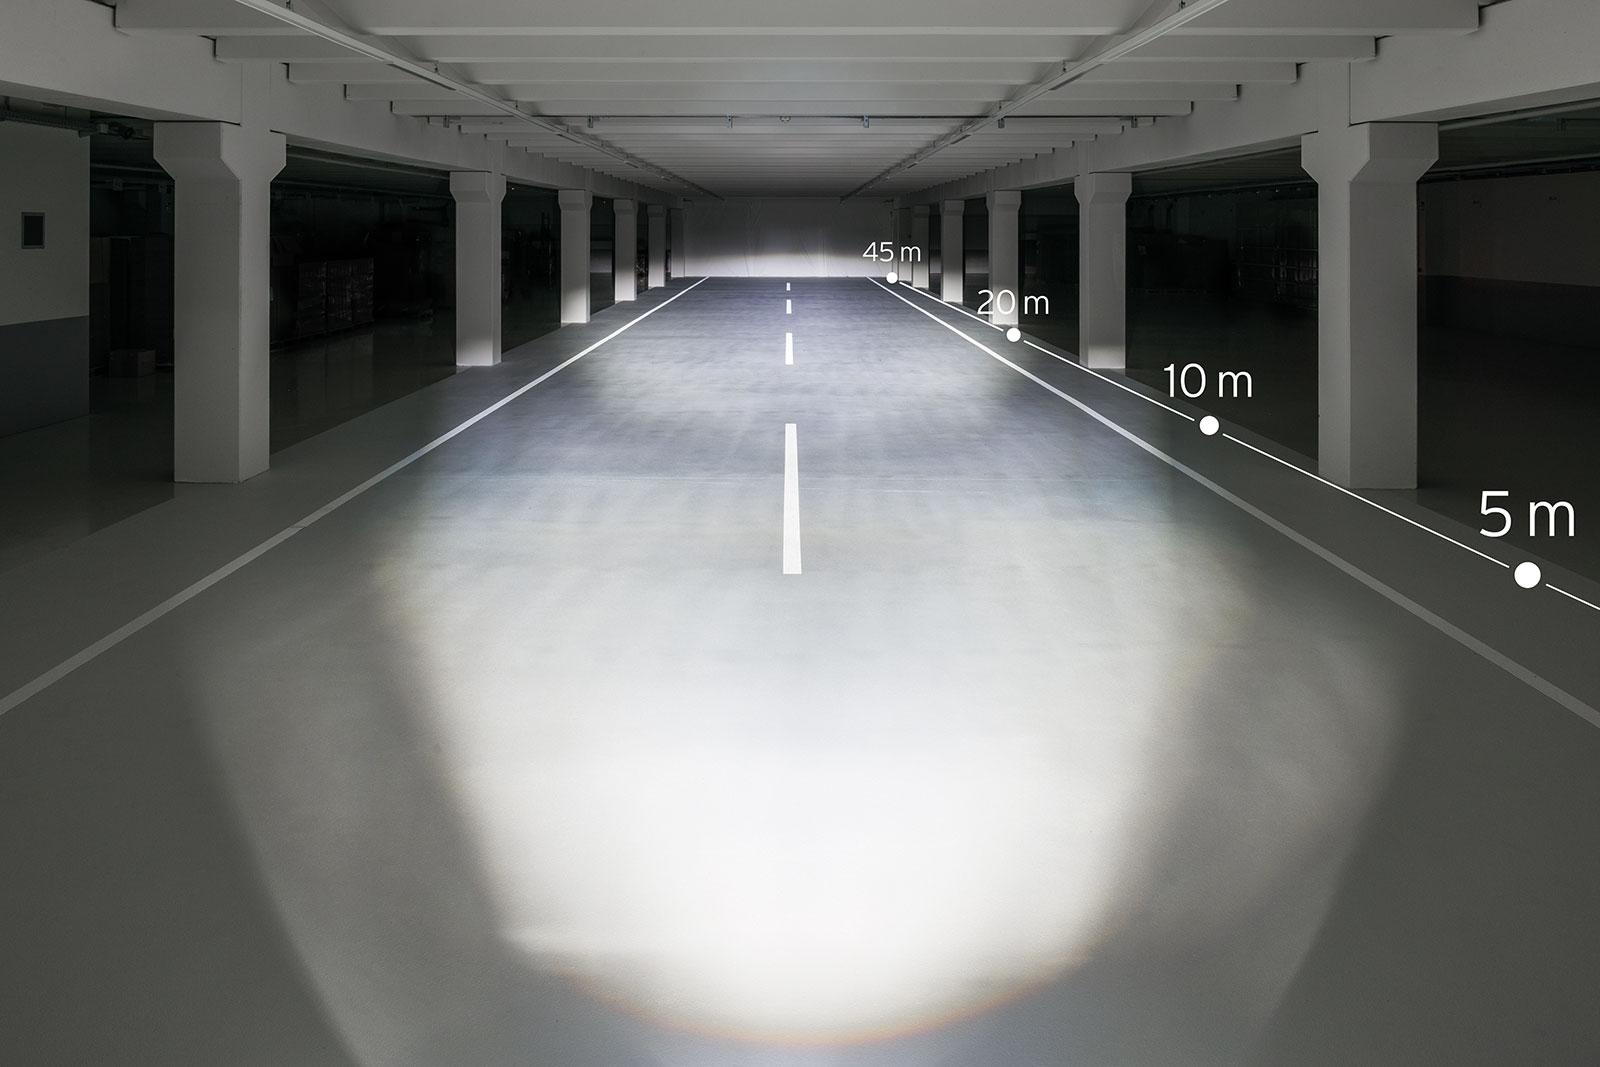 4006021010253-BUSCH-M-LLER-Lumotec-IQ-X-T-Senso-Plus-LED-Frontlampe-mit-StVZO-Zulassung-909464-08Ko5AkNCLmiIkG